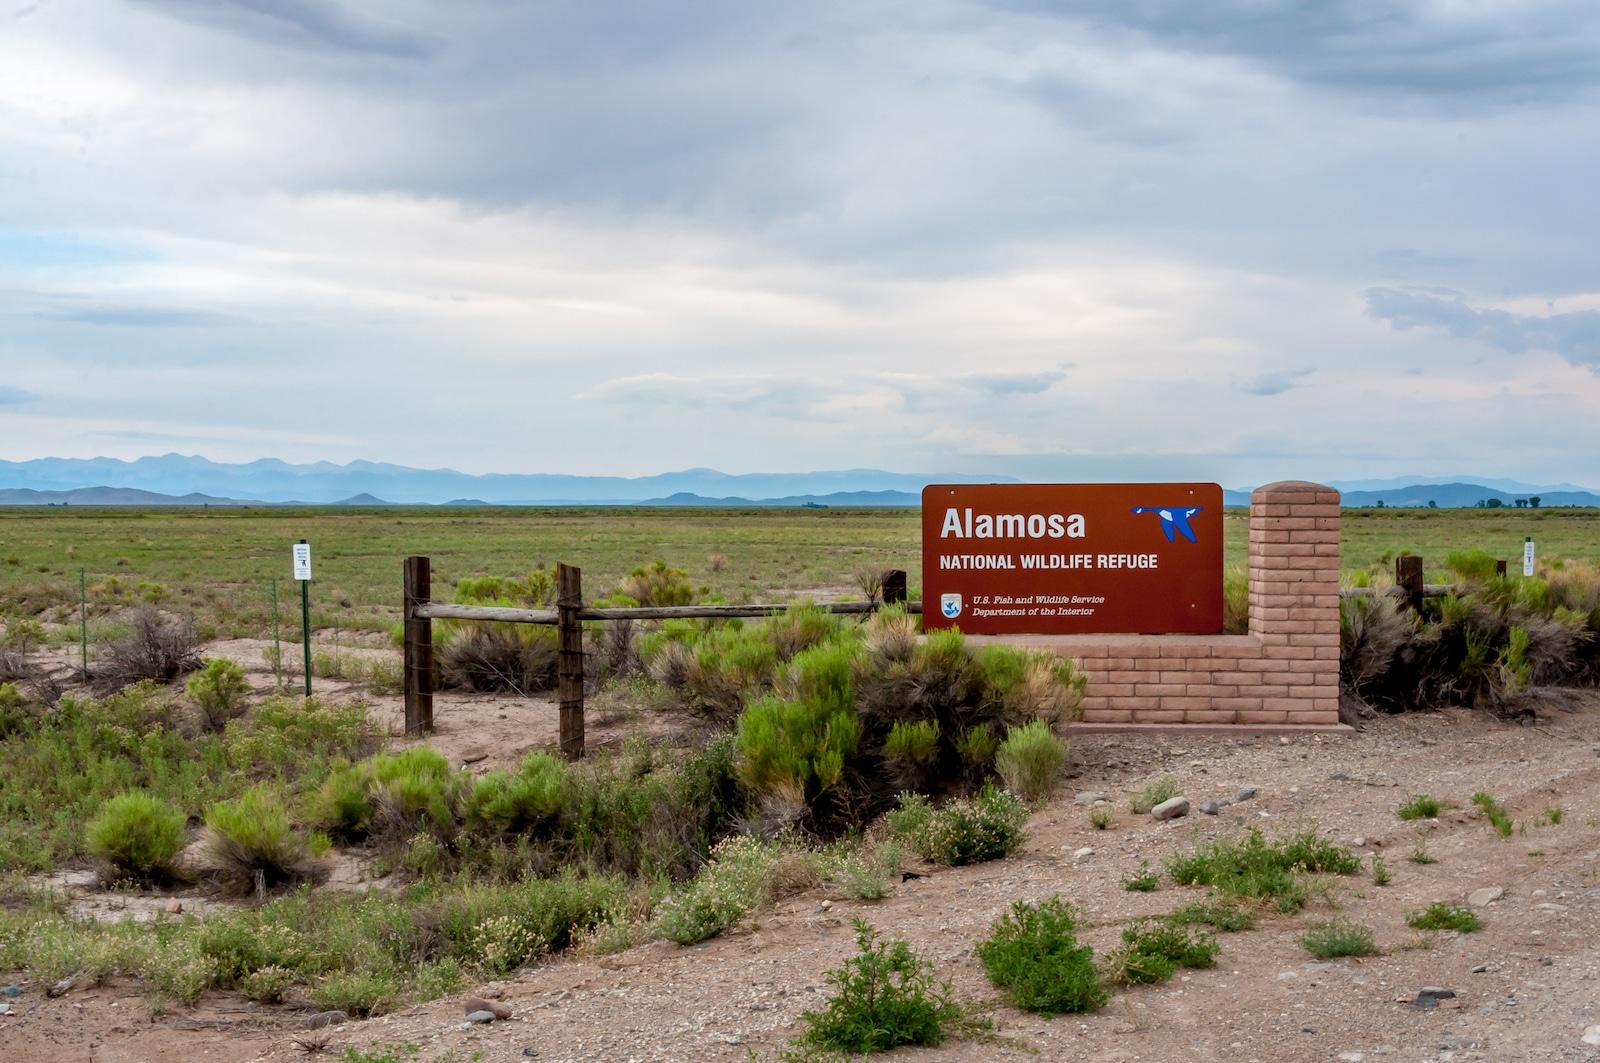 Suaka Margasatwa Nasional Alamosa, Alamosa